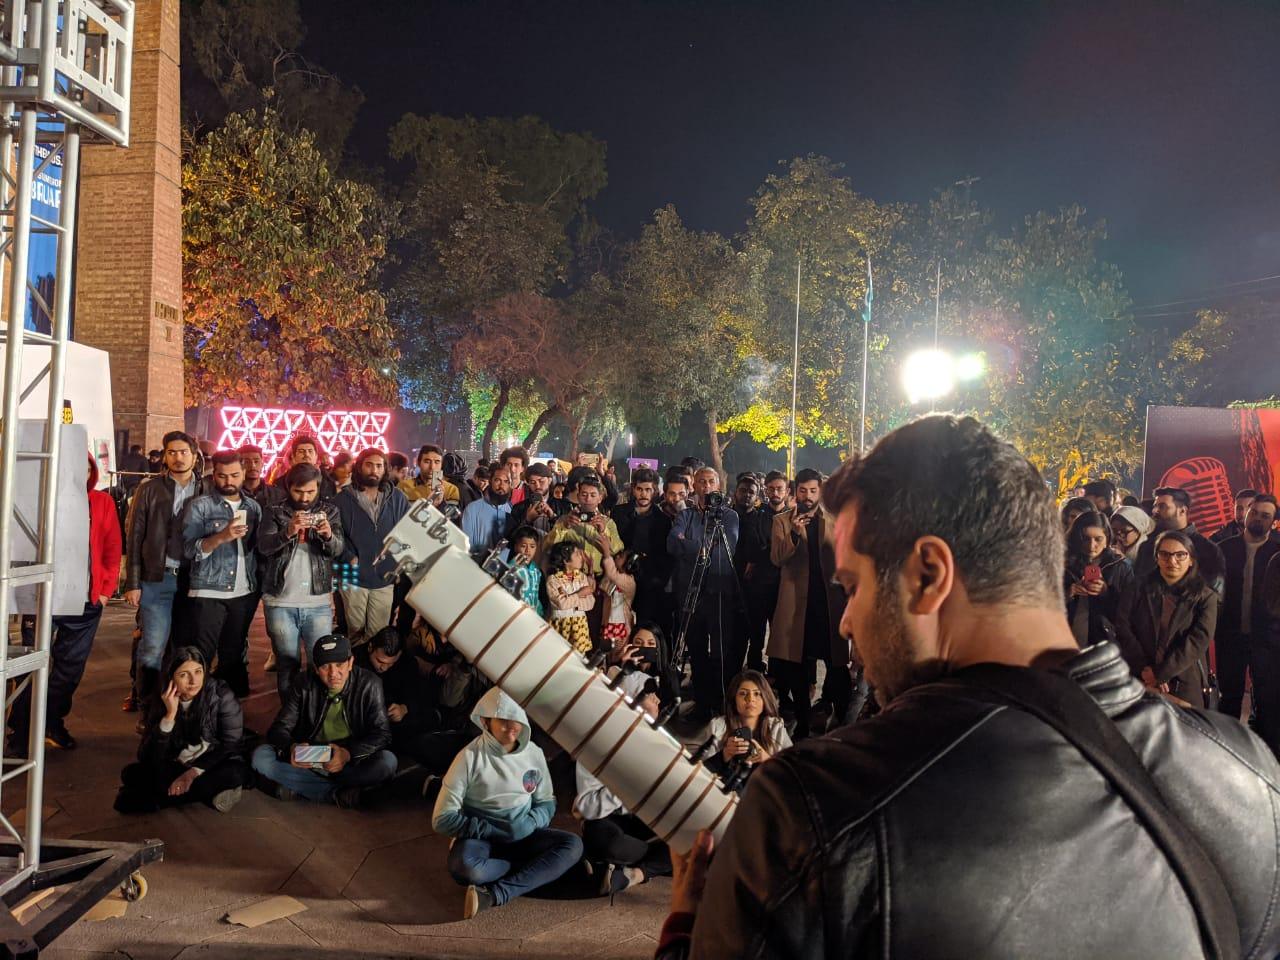 LMM – Lahore Music Meet